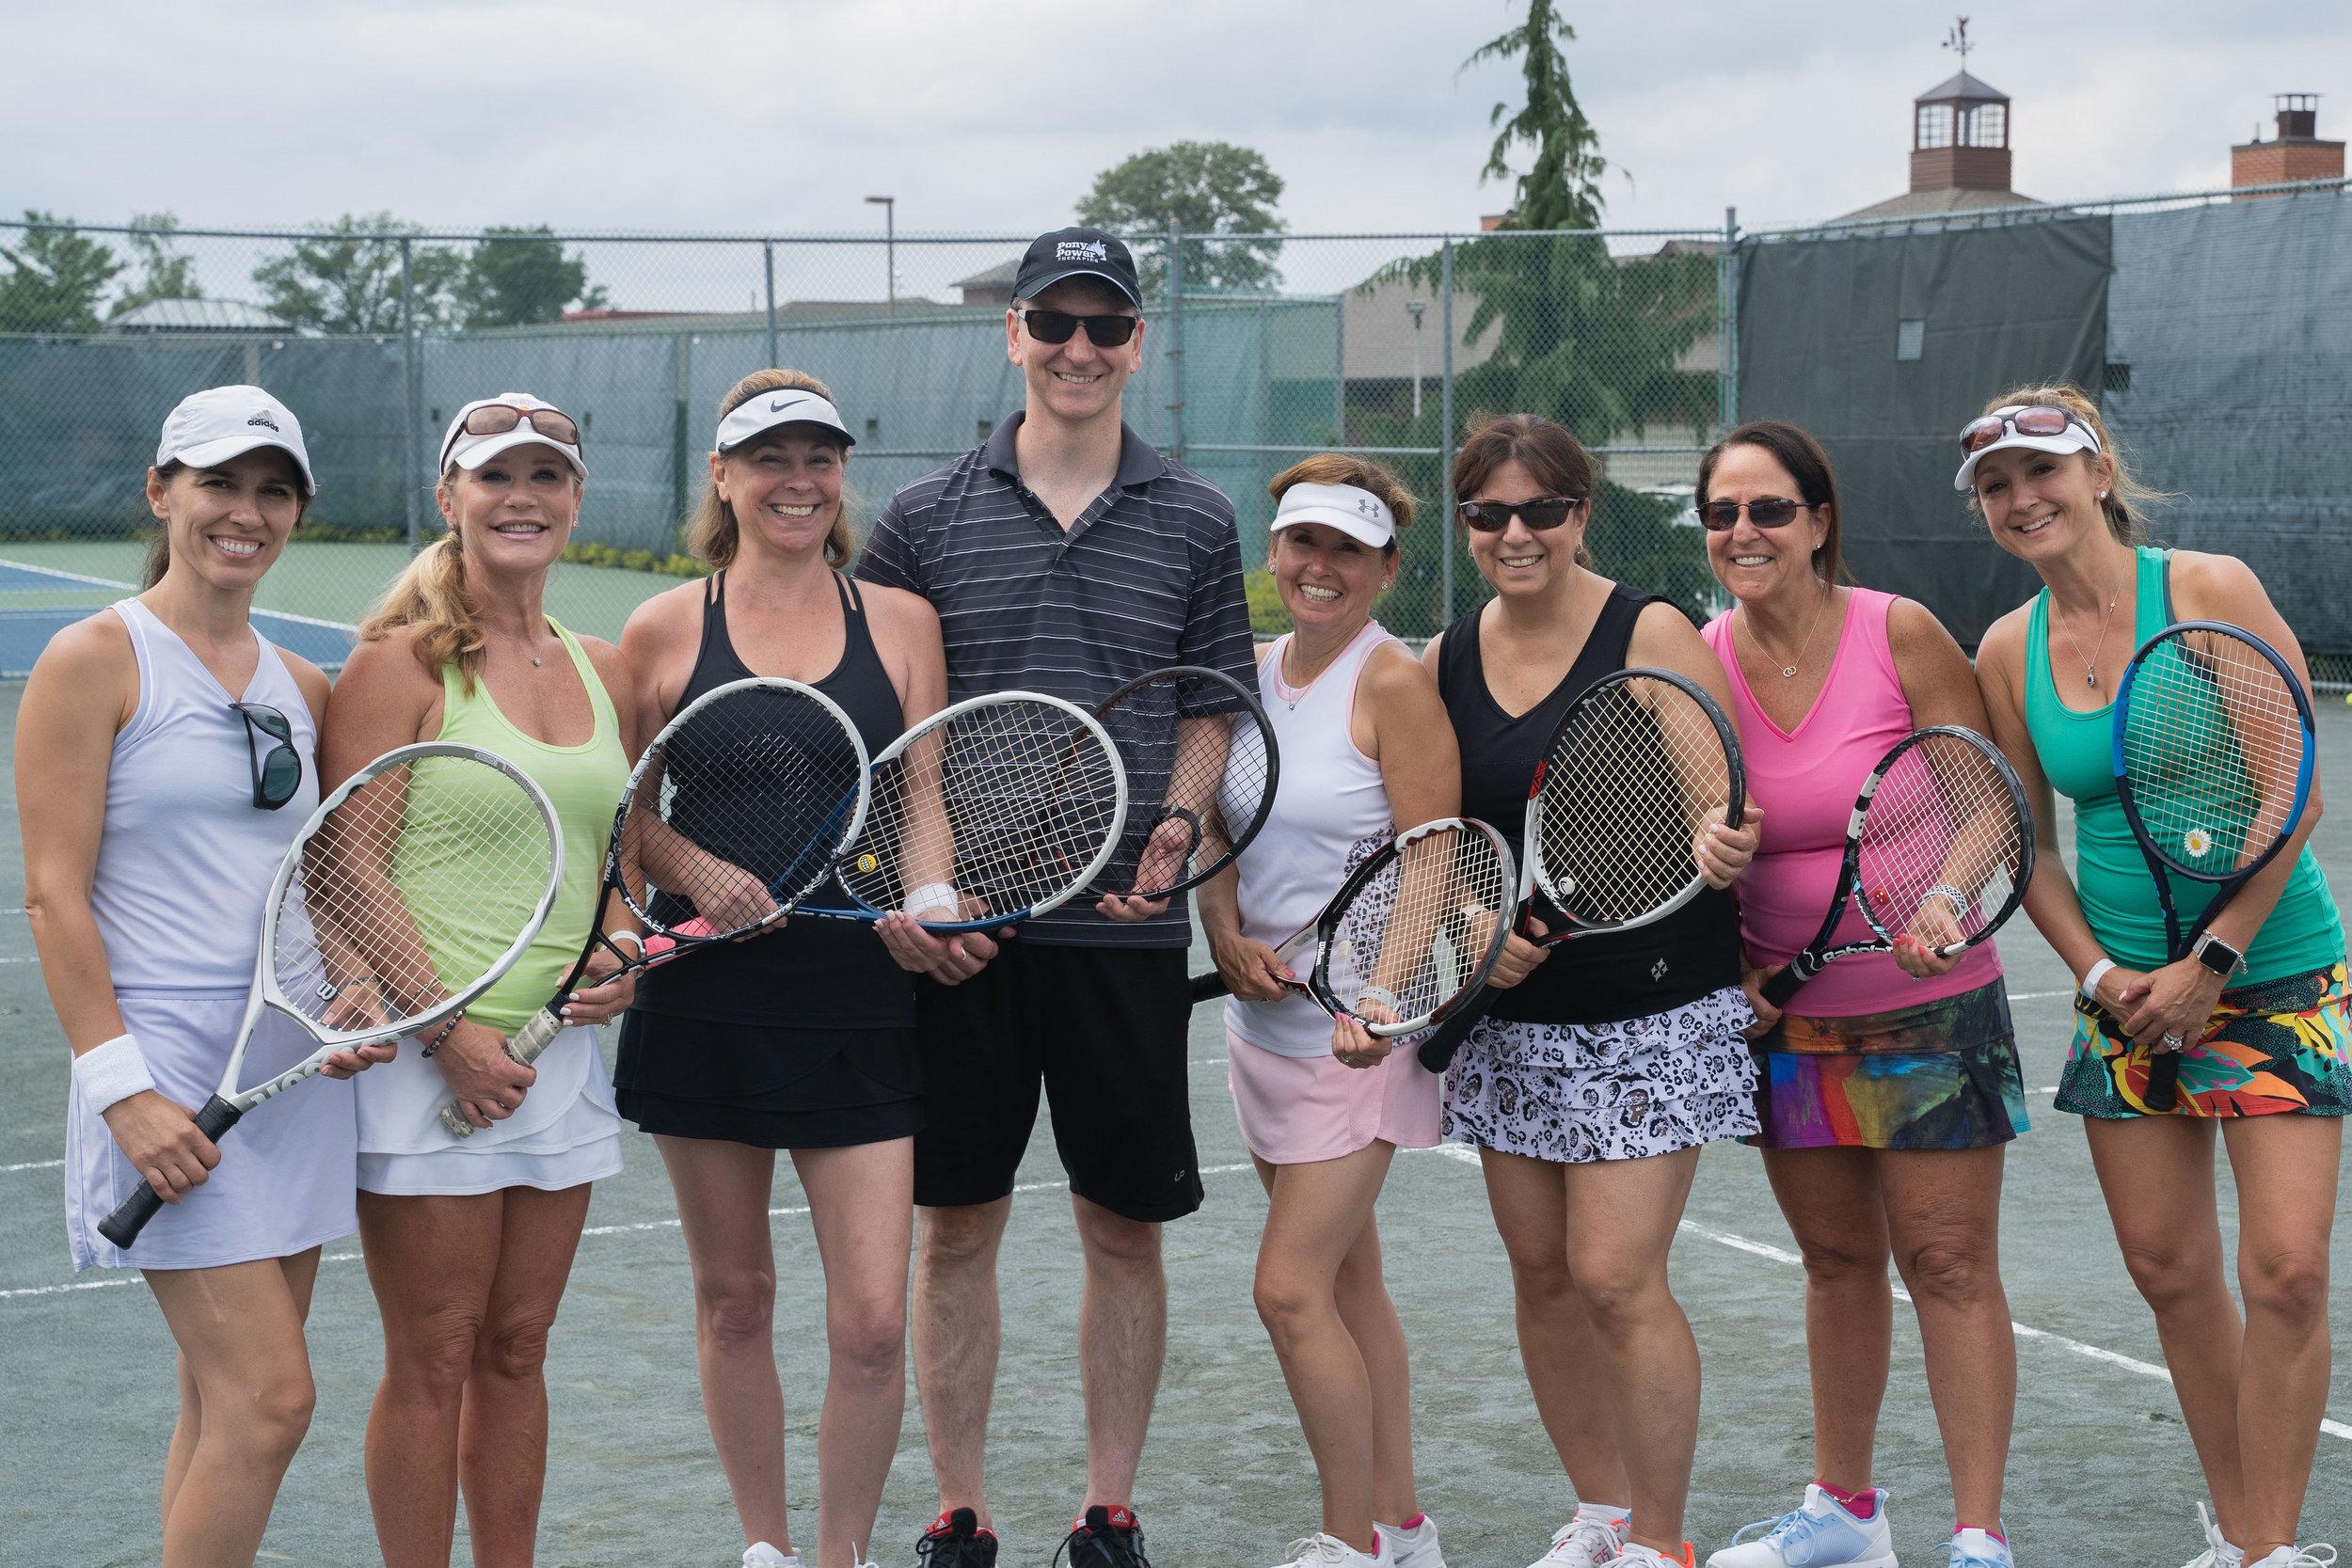 group tennis shot.jpg